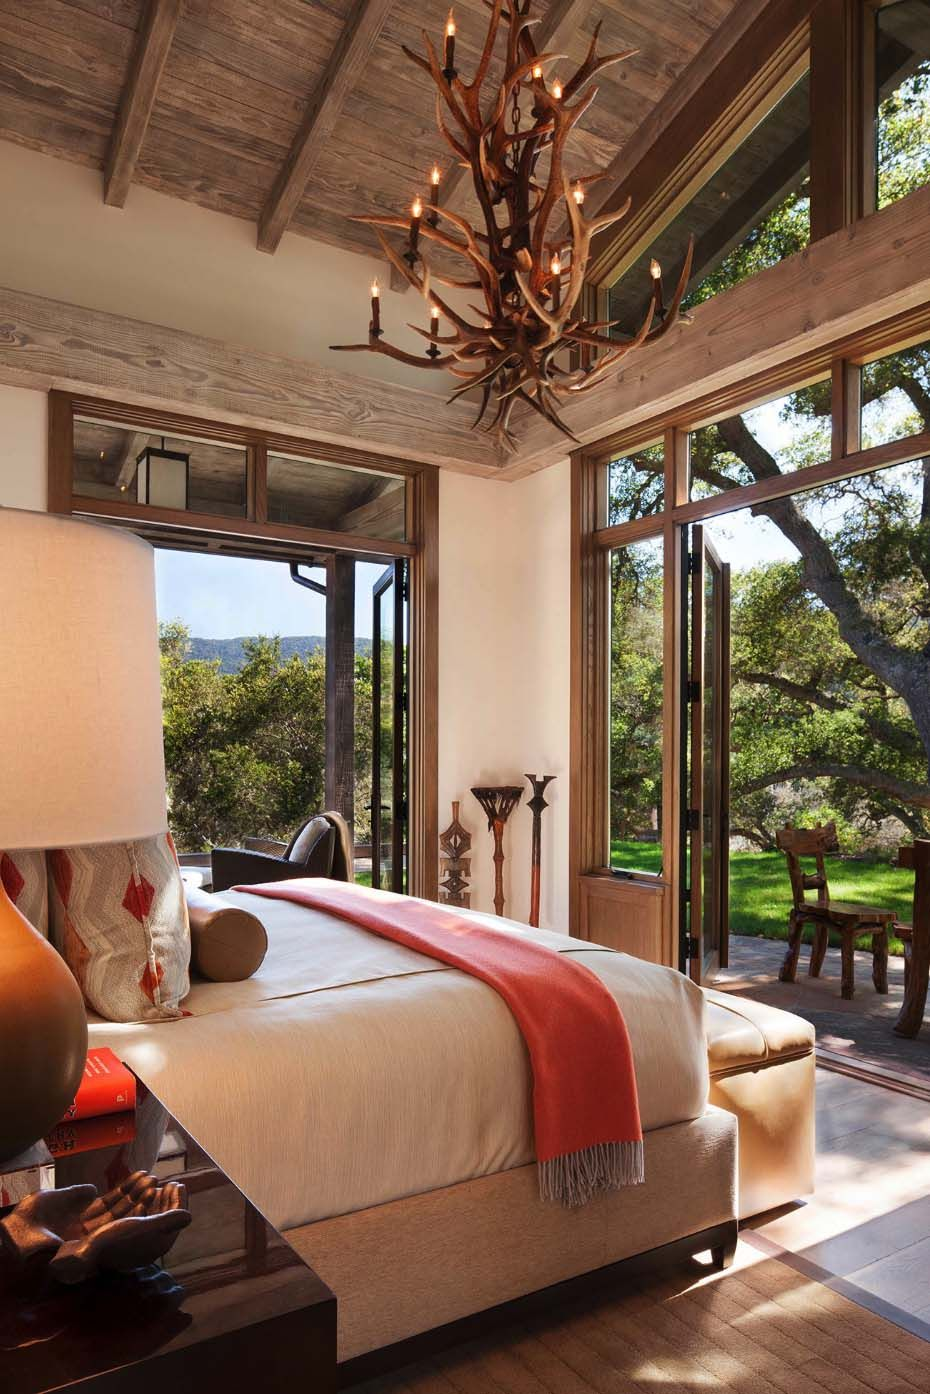 Spanish style hacienda in Carmel Valley showcases inviting design